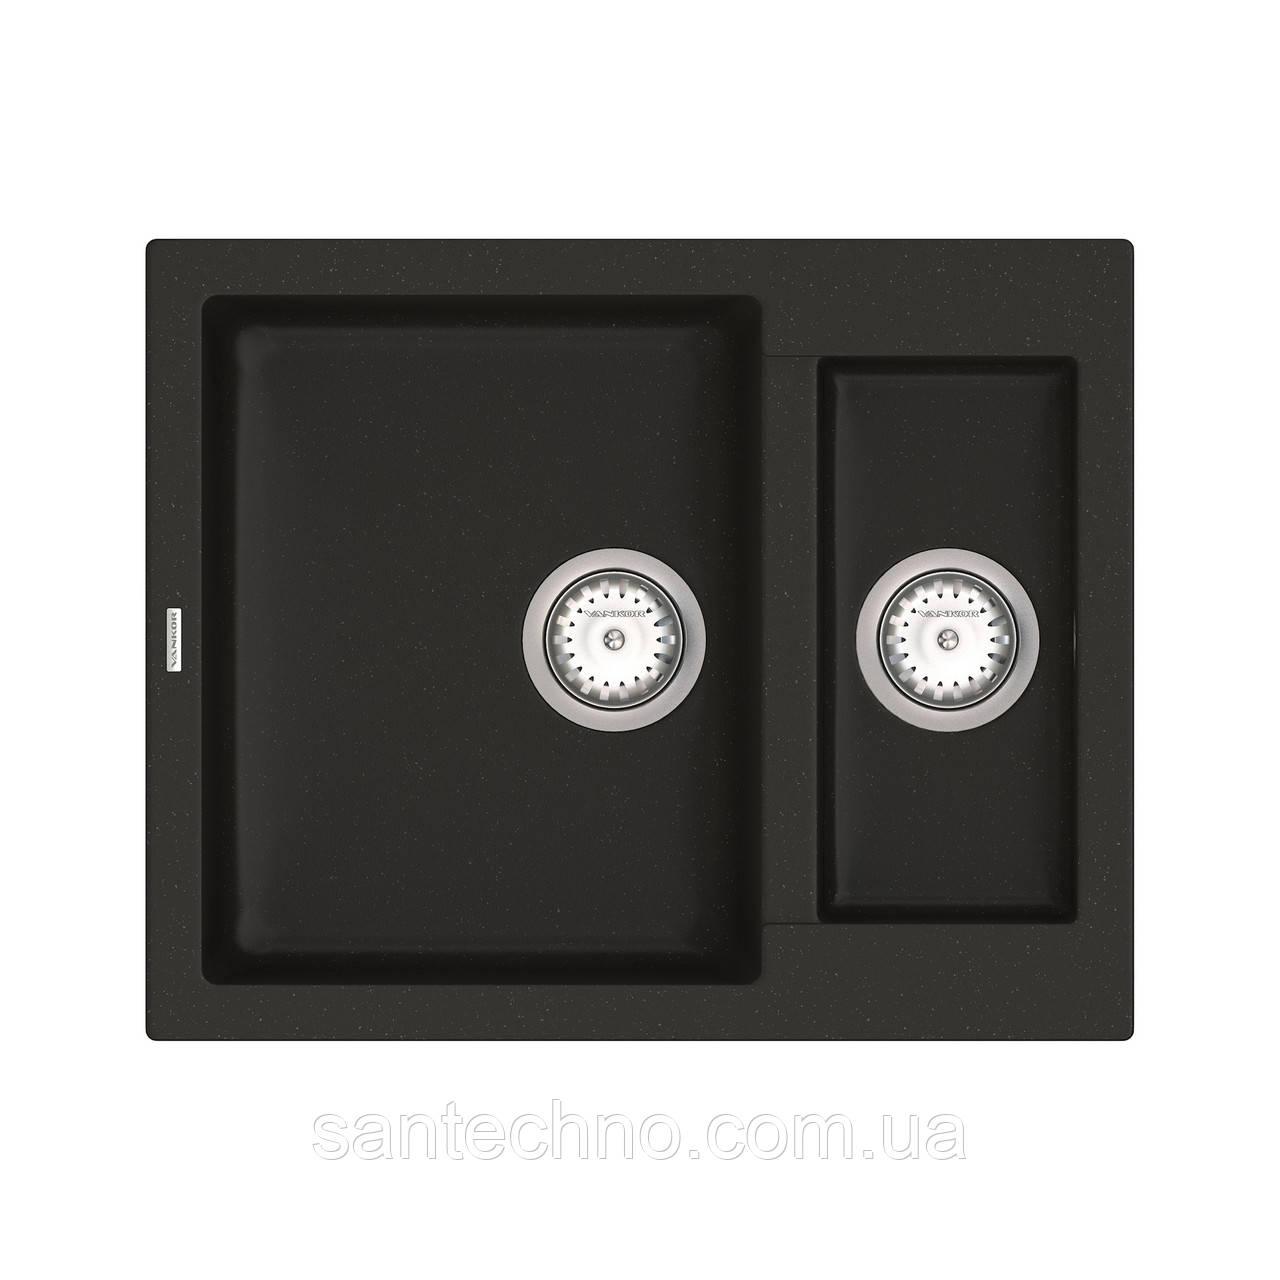 Кухонная врезная мойка на 2 чаши VANKOR Orman OMP 03.61 Black + сифон VANKOR